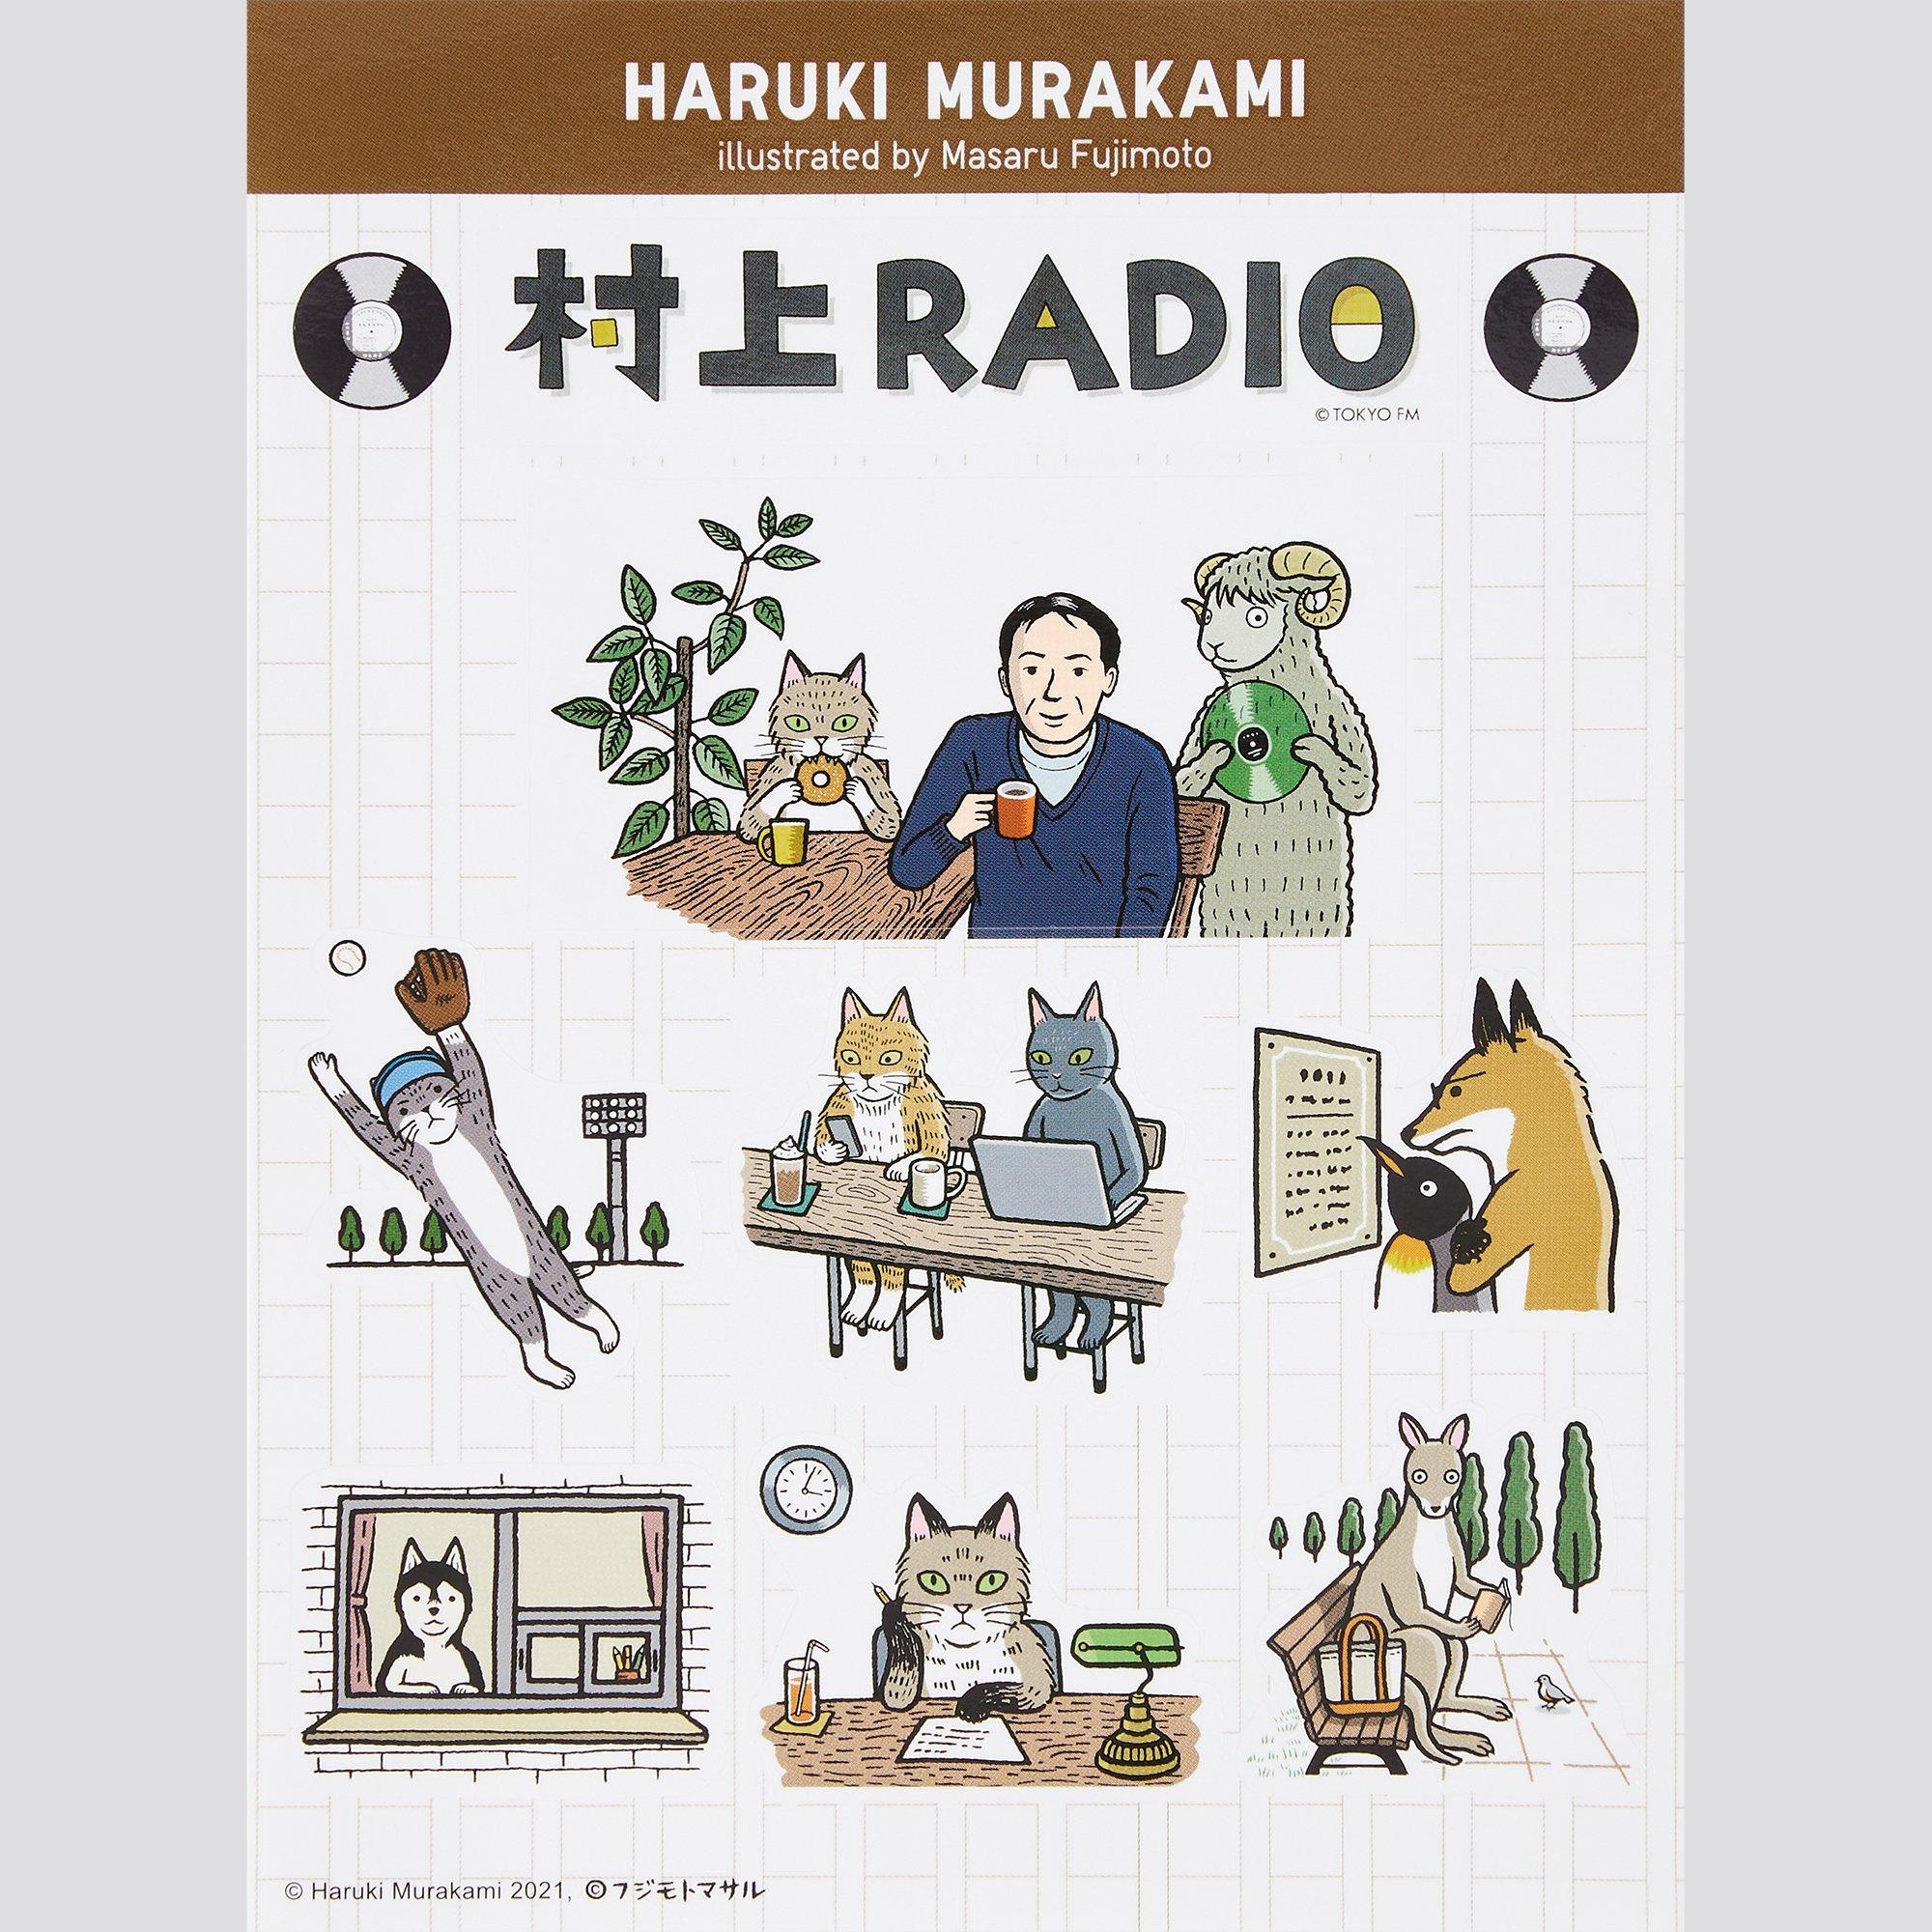 Uniqlo brings the creative world of Haruki Murakami to its new UT collection 27